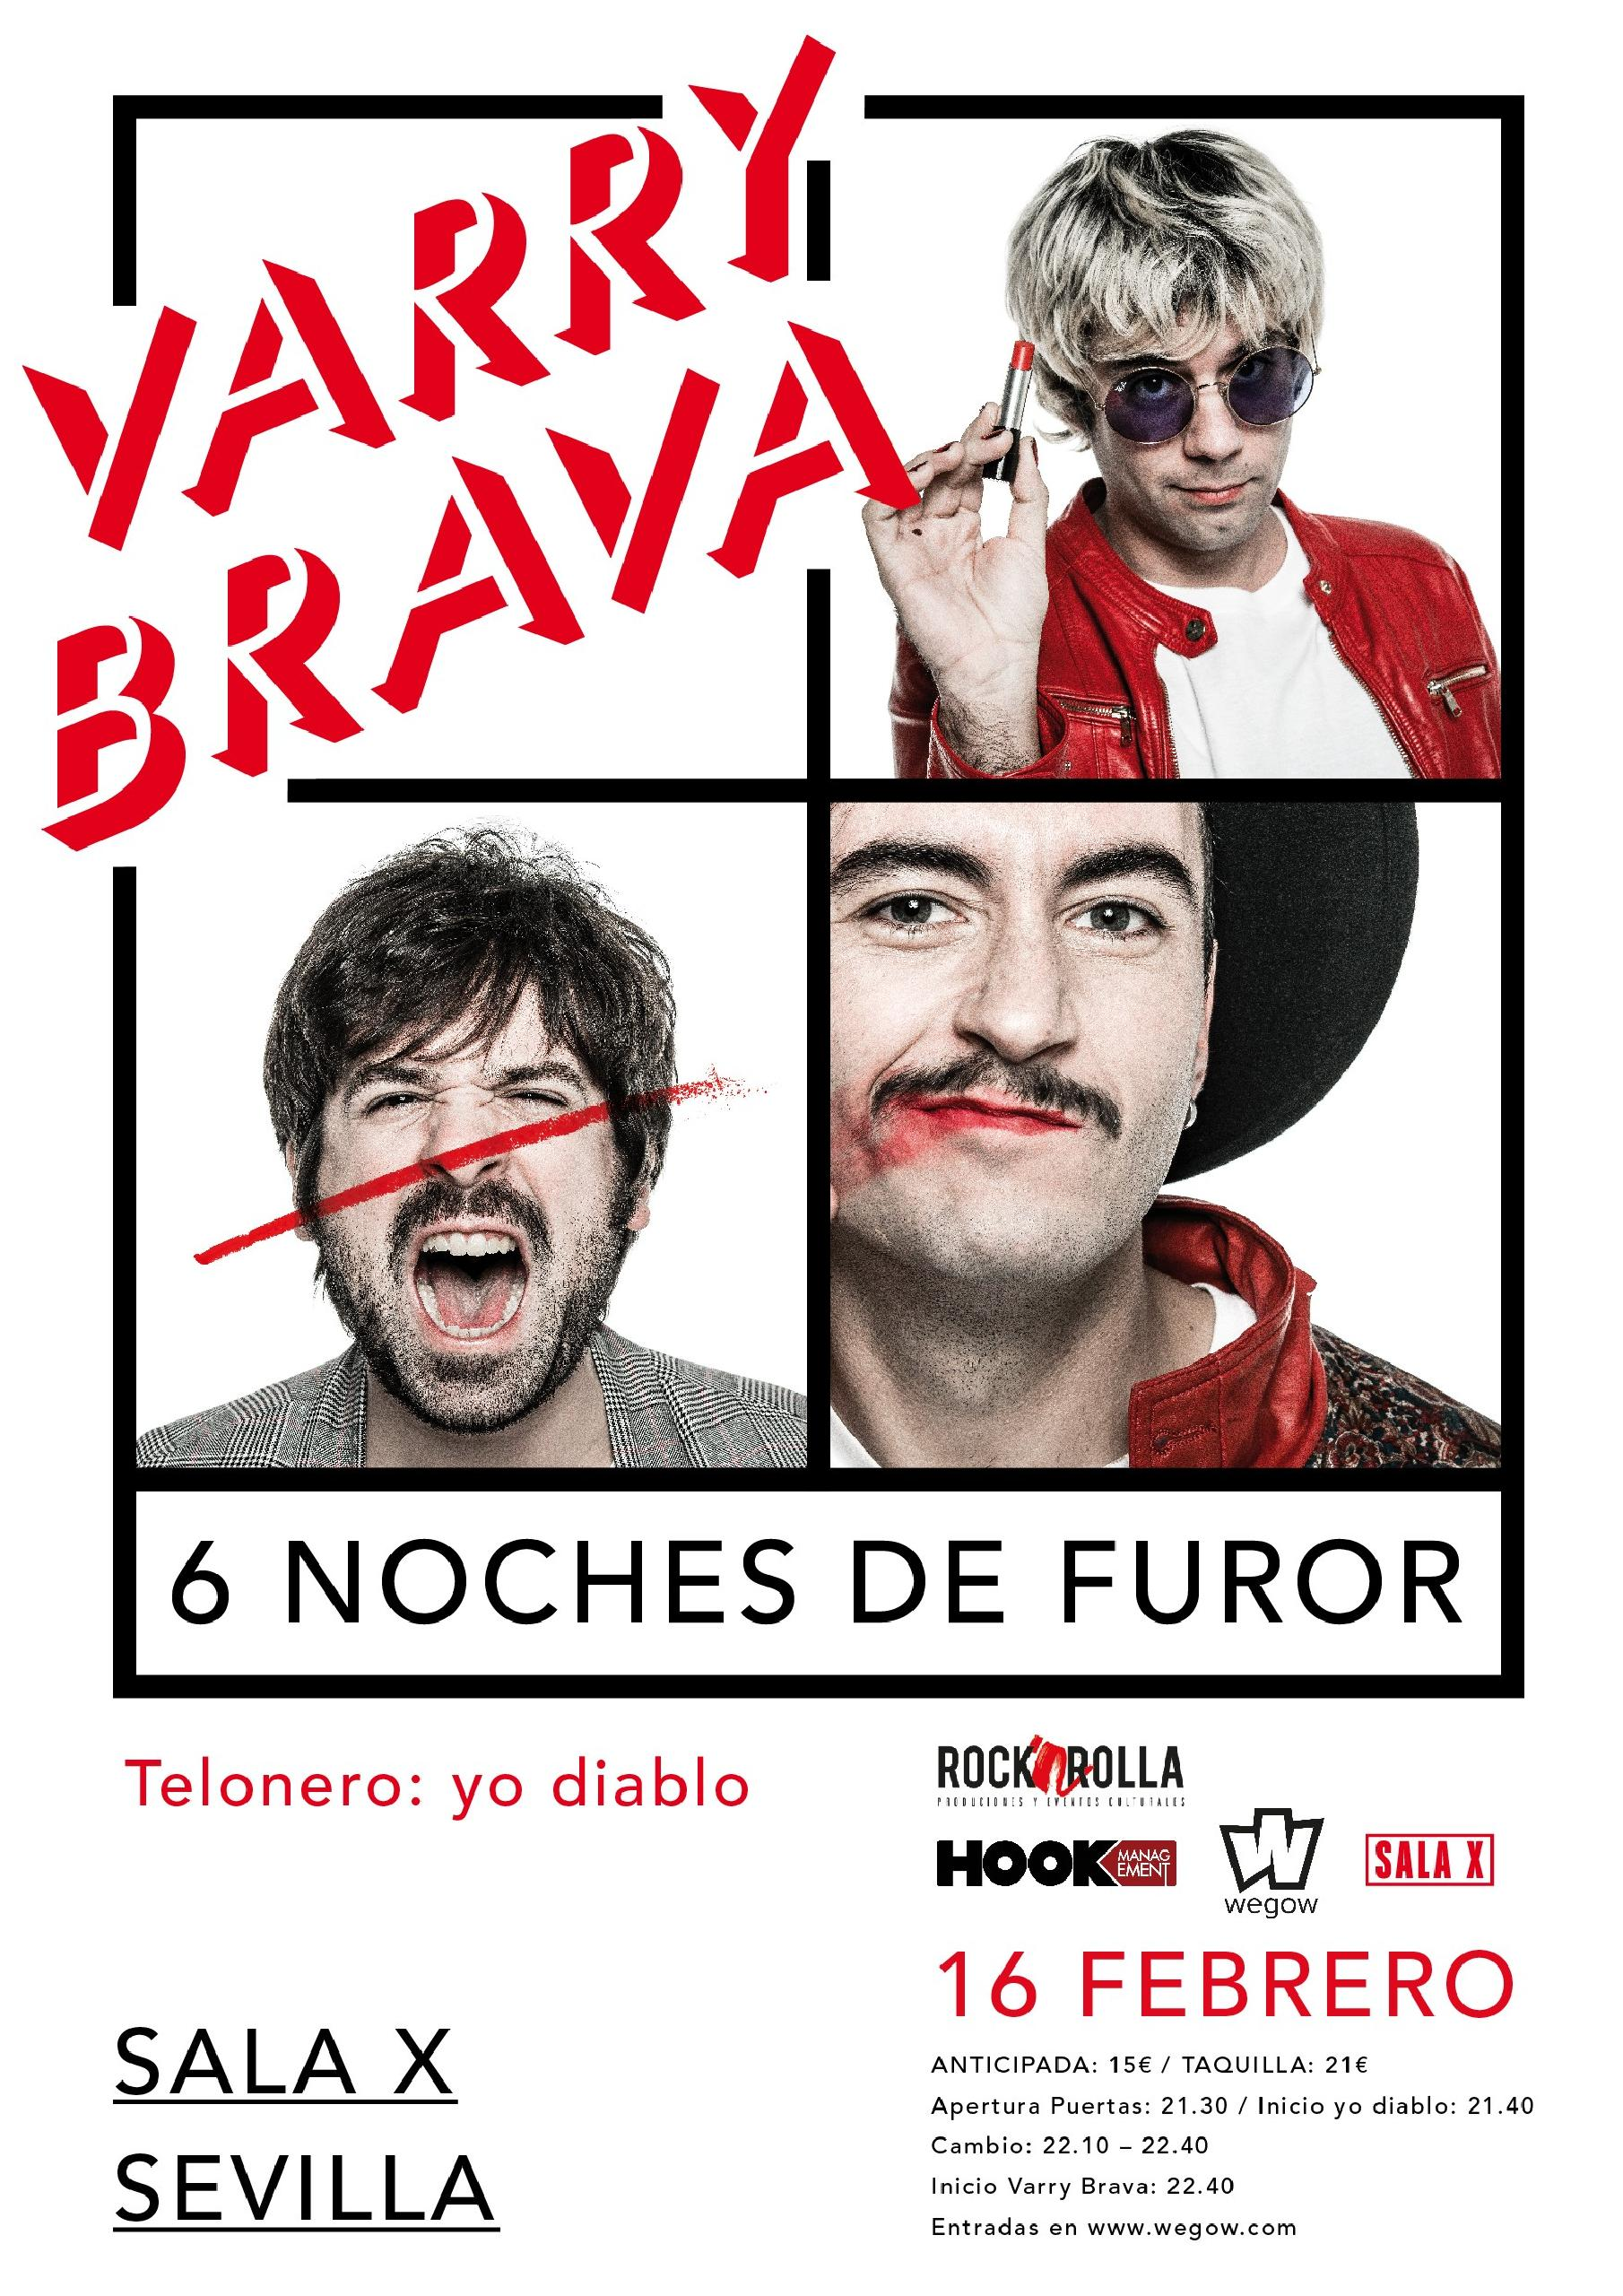 Varry Brava Sala X Sevilla